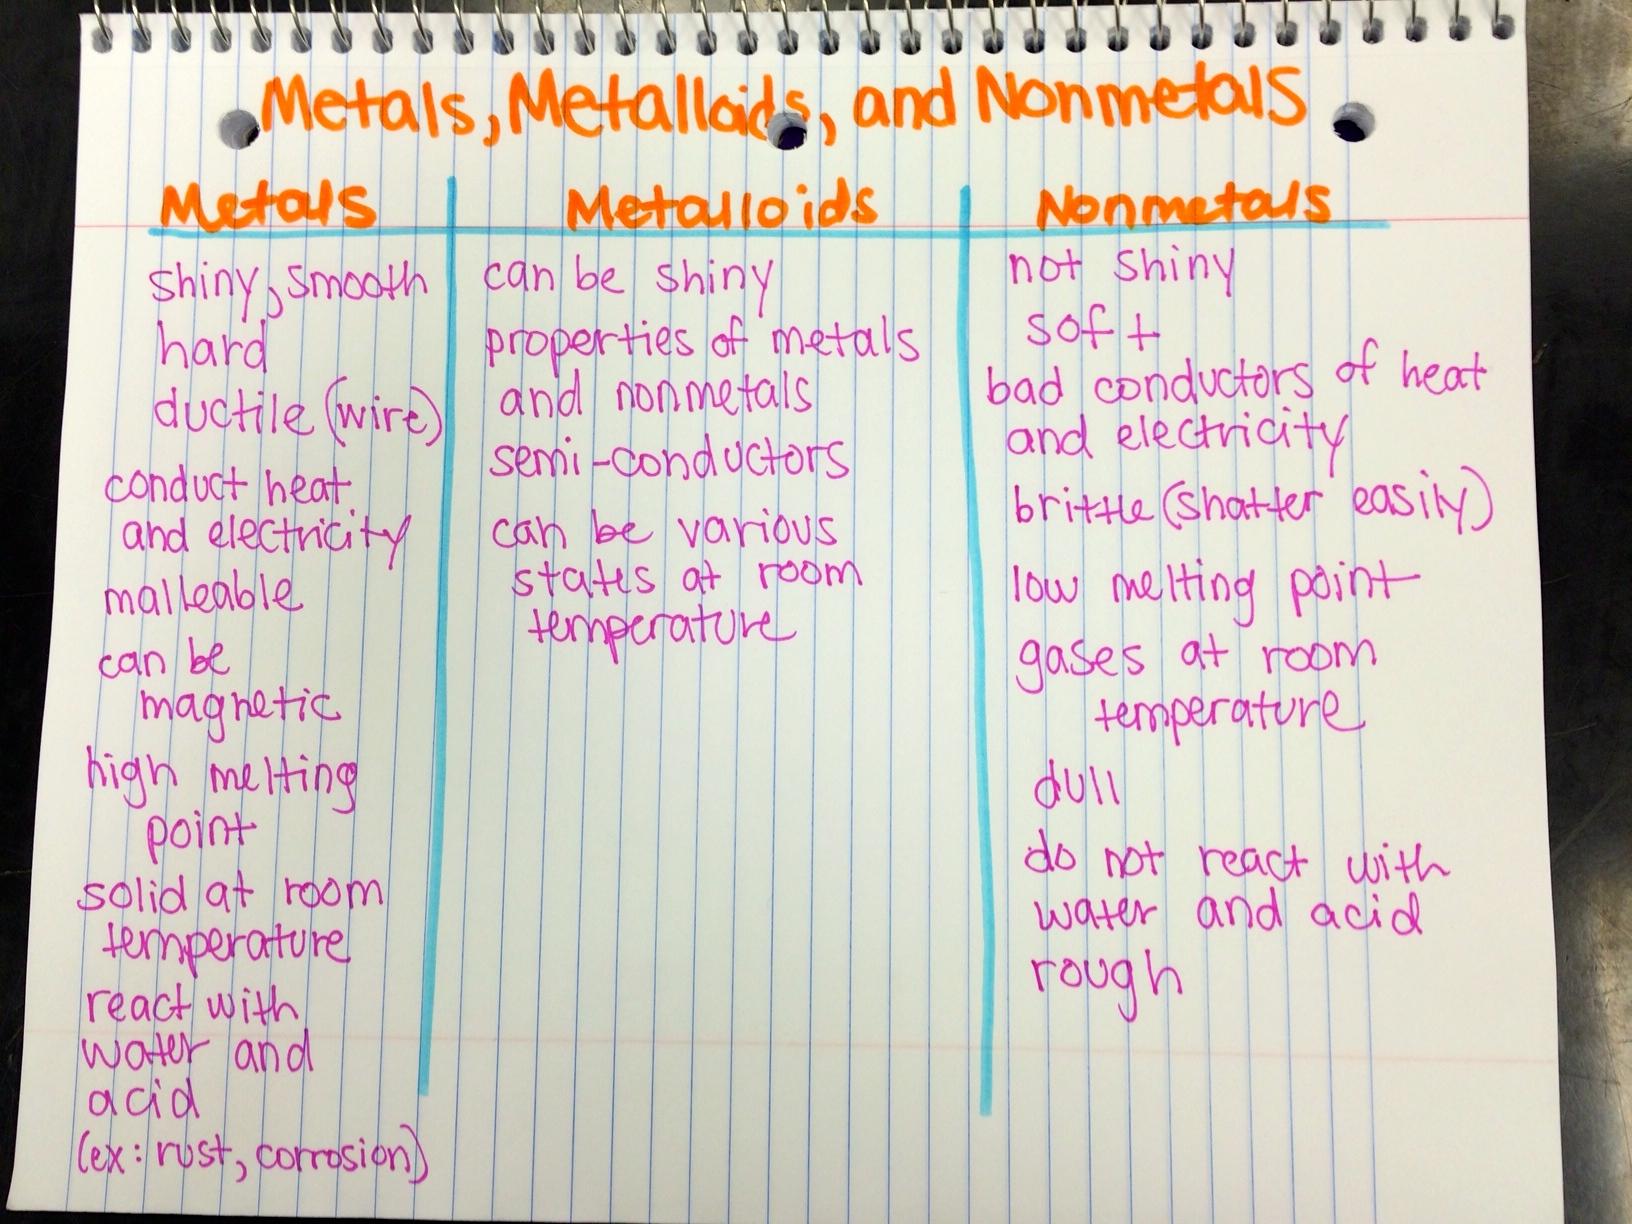 Properties Of Metals Metalloids And Nonmetals